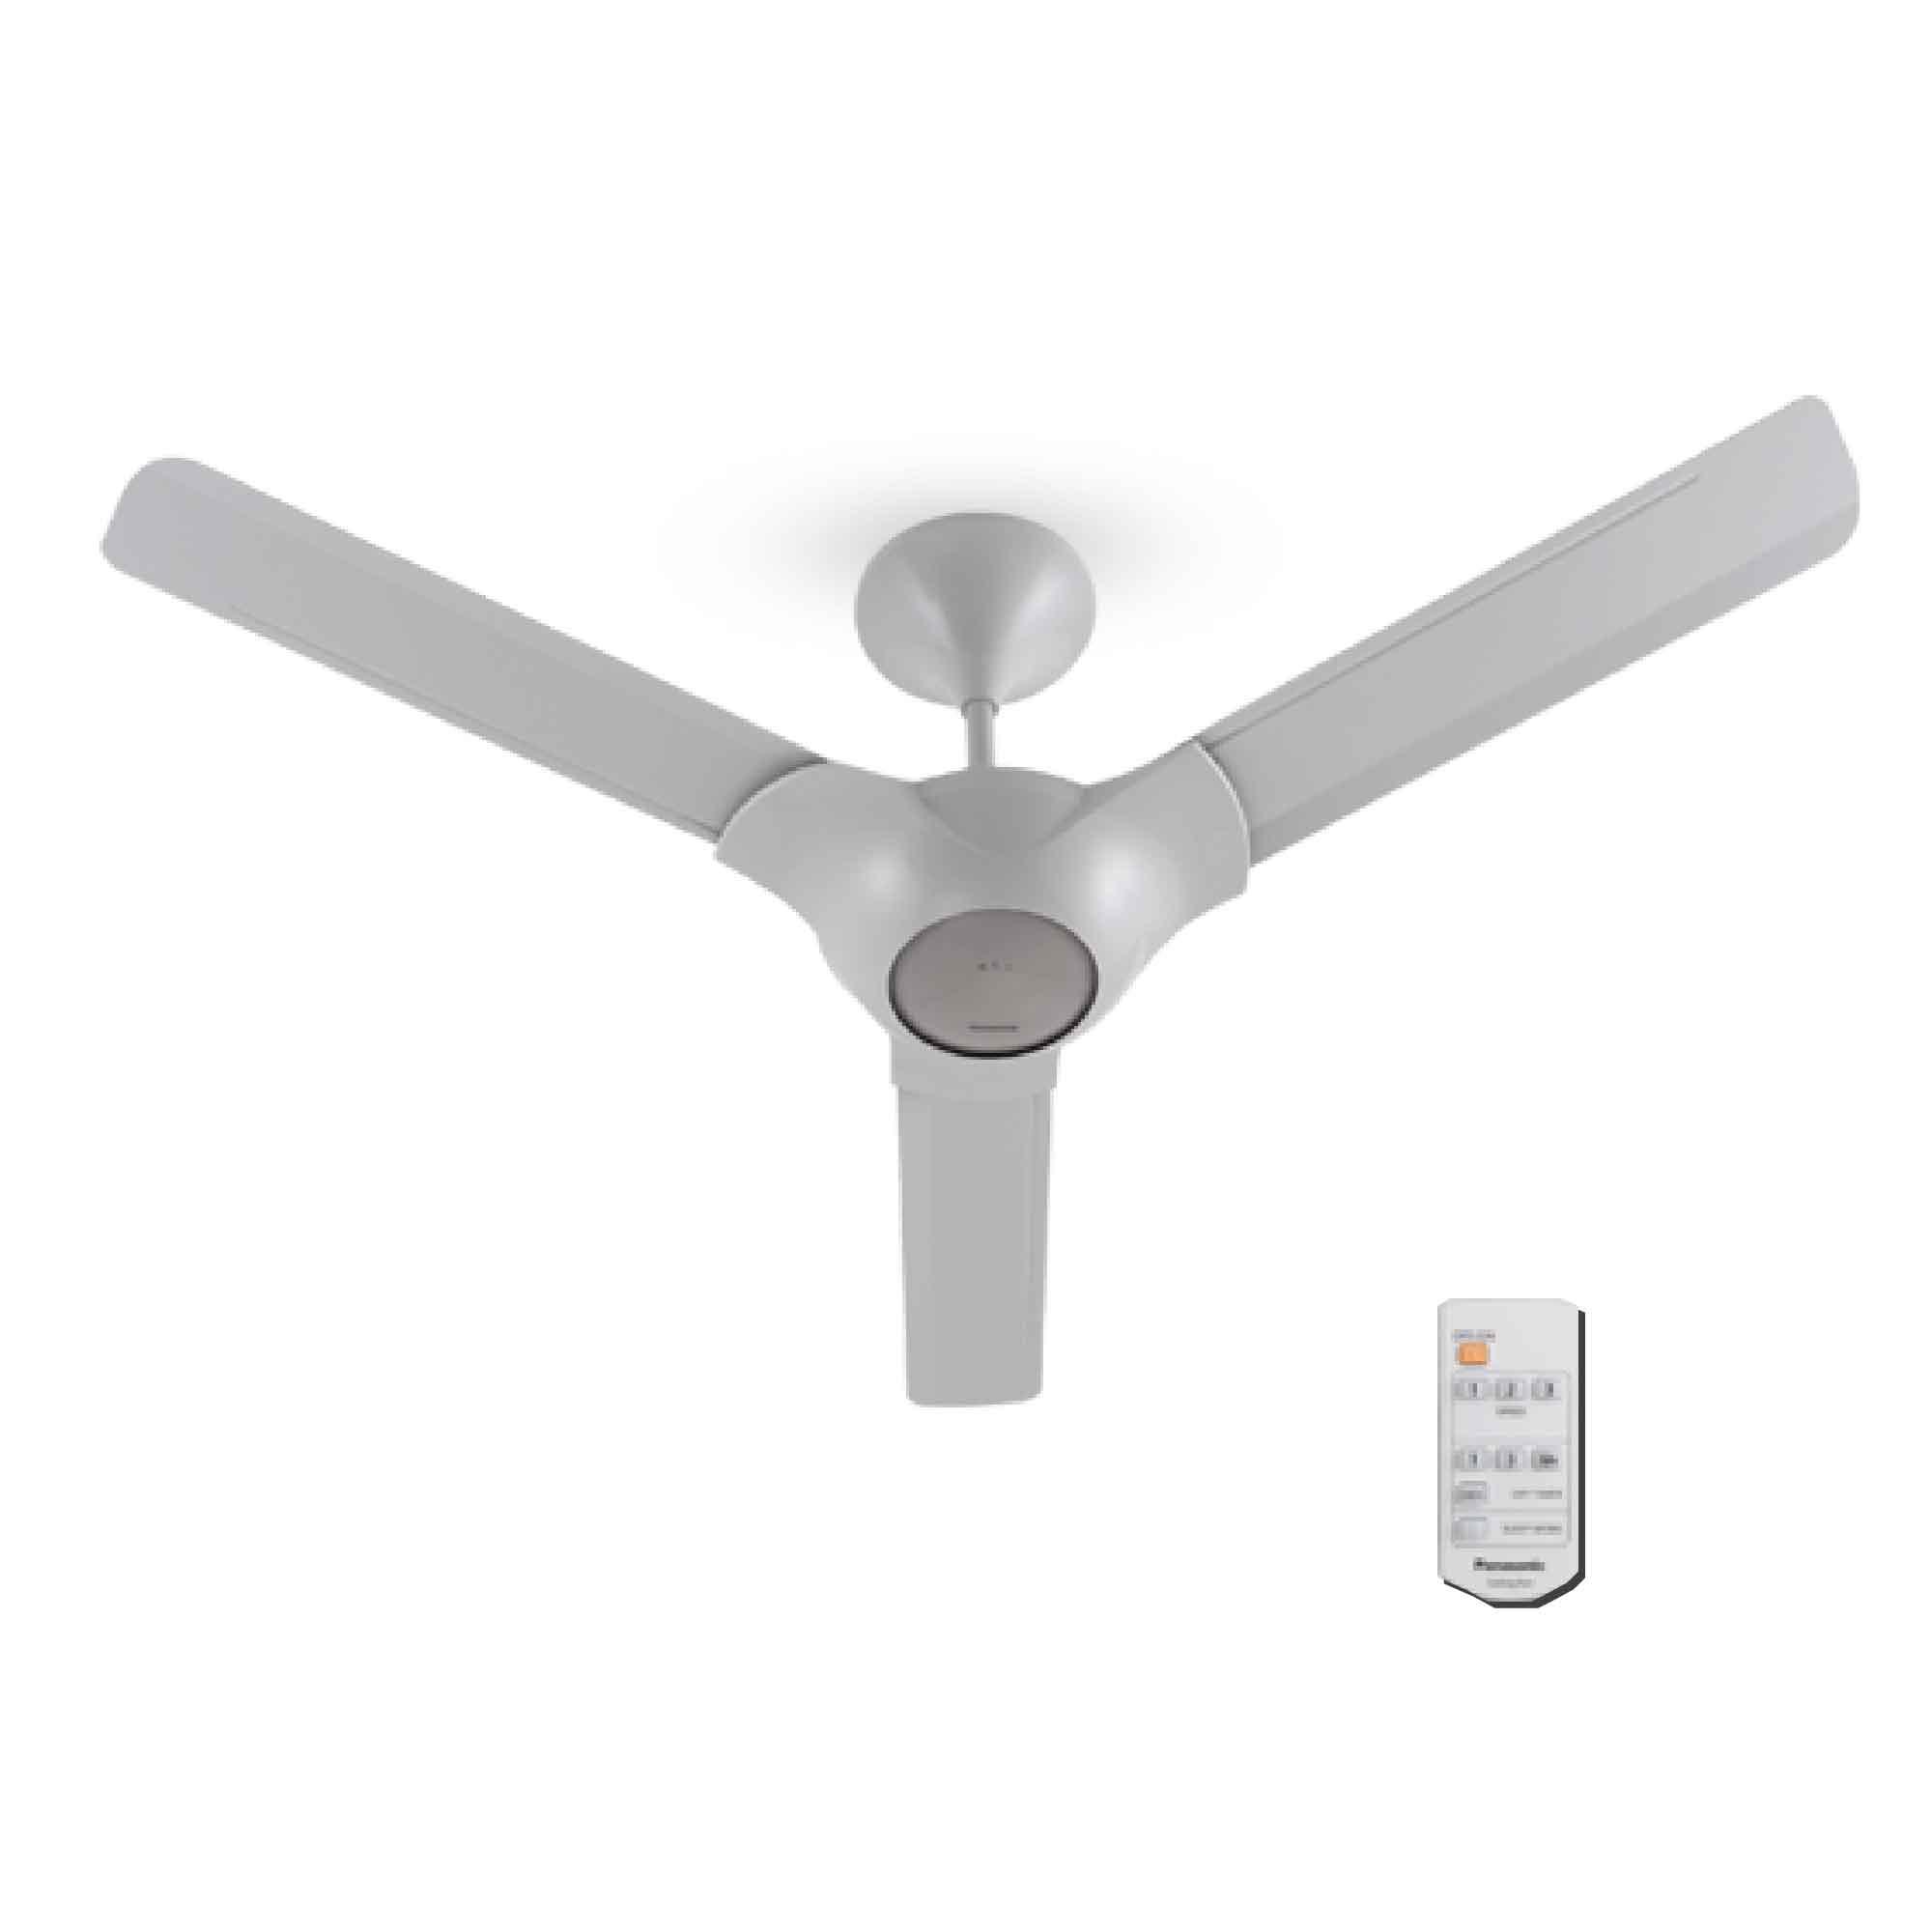 Panasonic Ceiling Fan F M14C2 56 Inc end 5 2 2020 7 51 PM